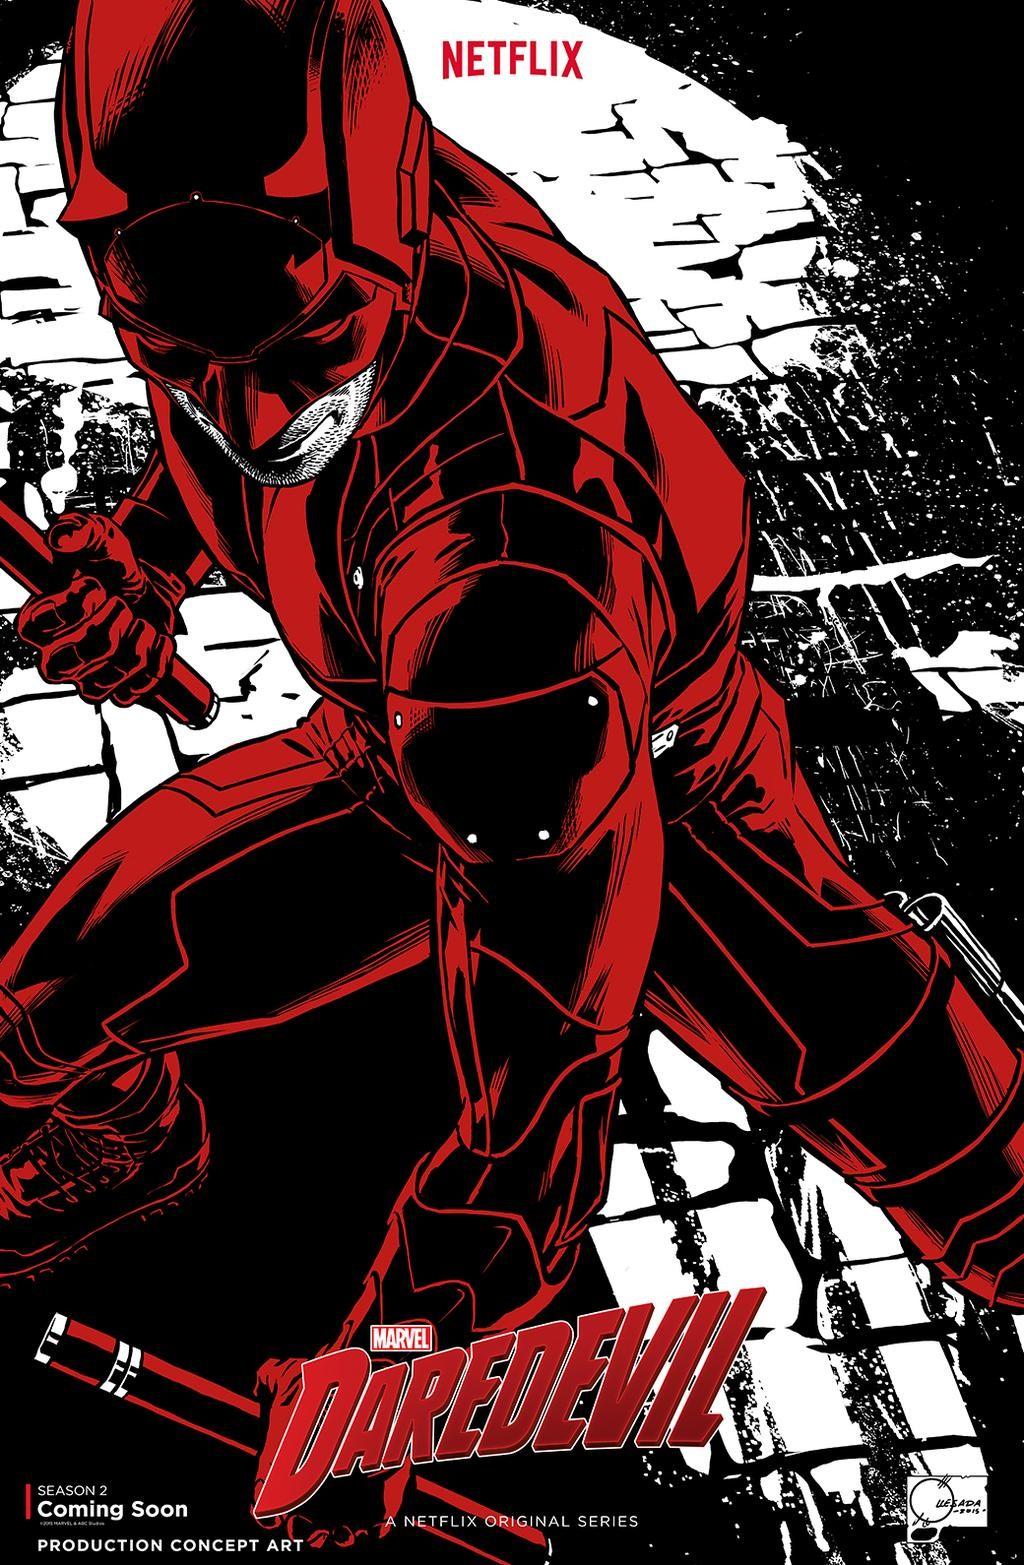 [Series] Marvel's DAREDEVIL -Netflix- - Página 5 41393